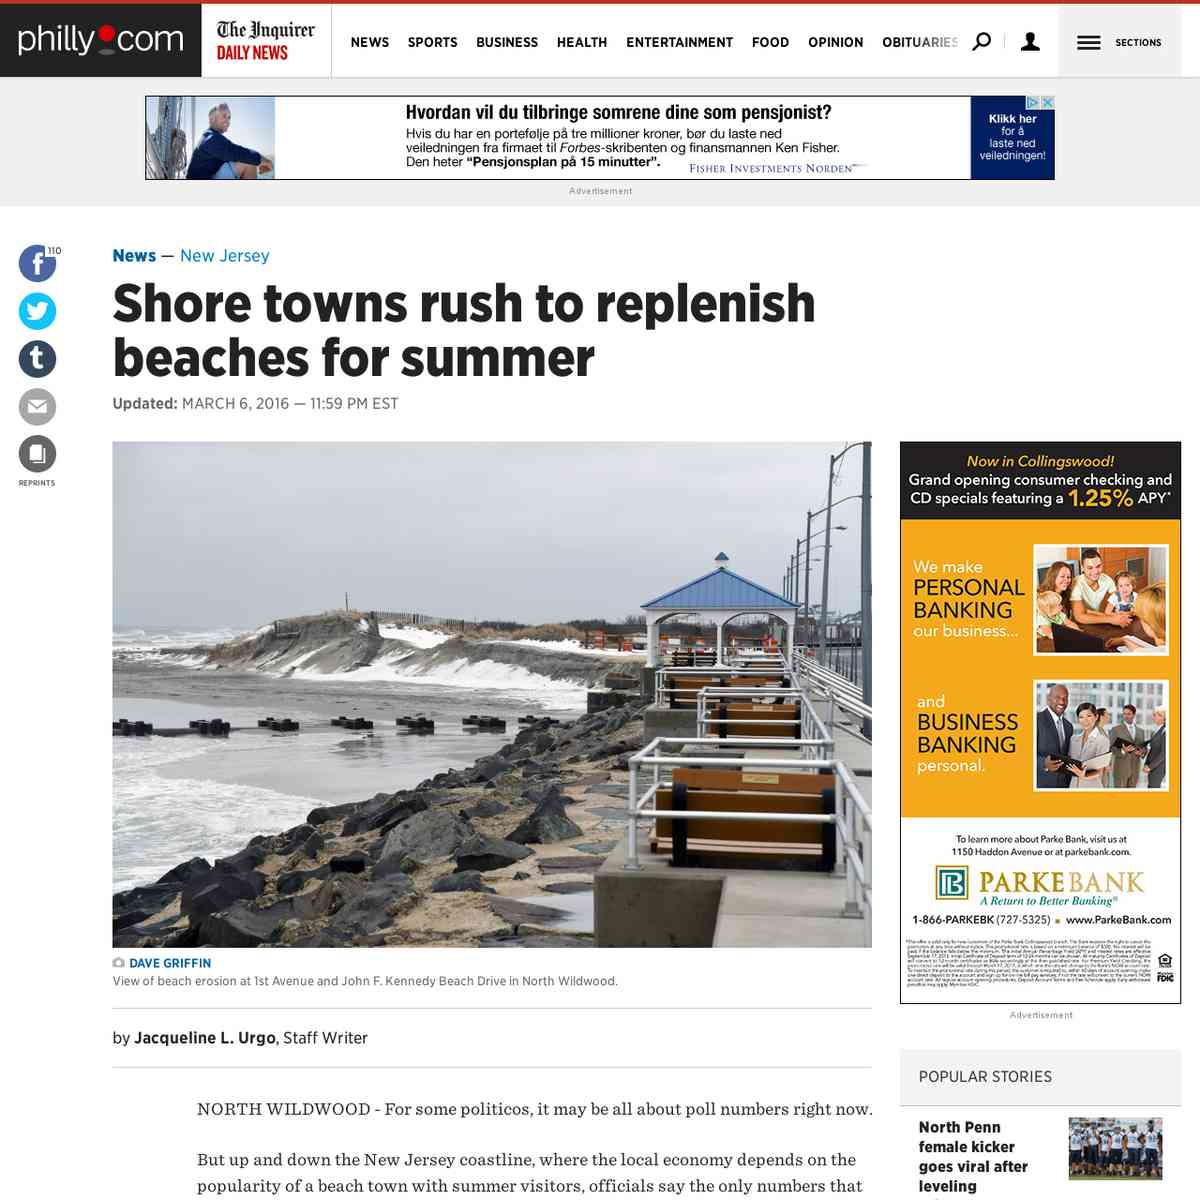 Shore towns rush to replenish beaches for summer